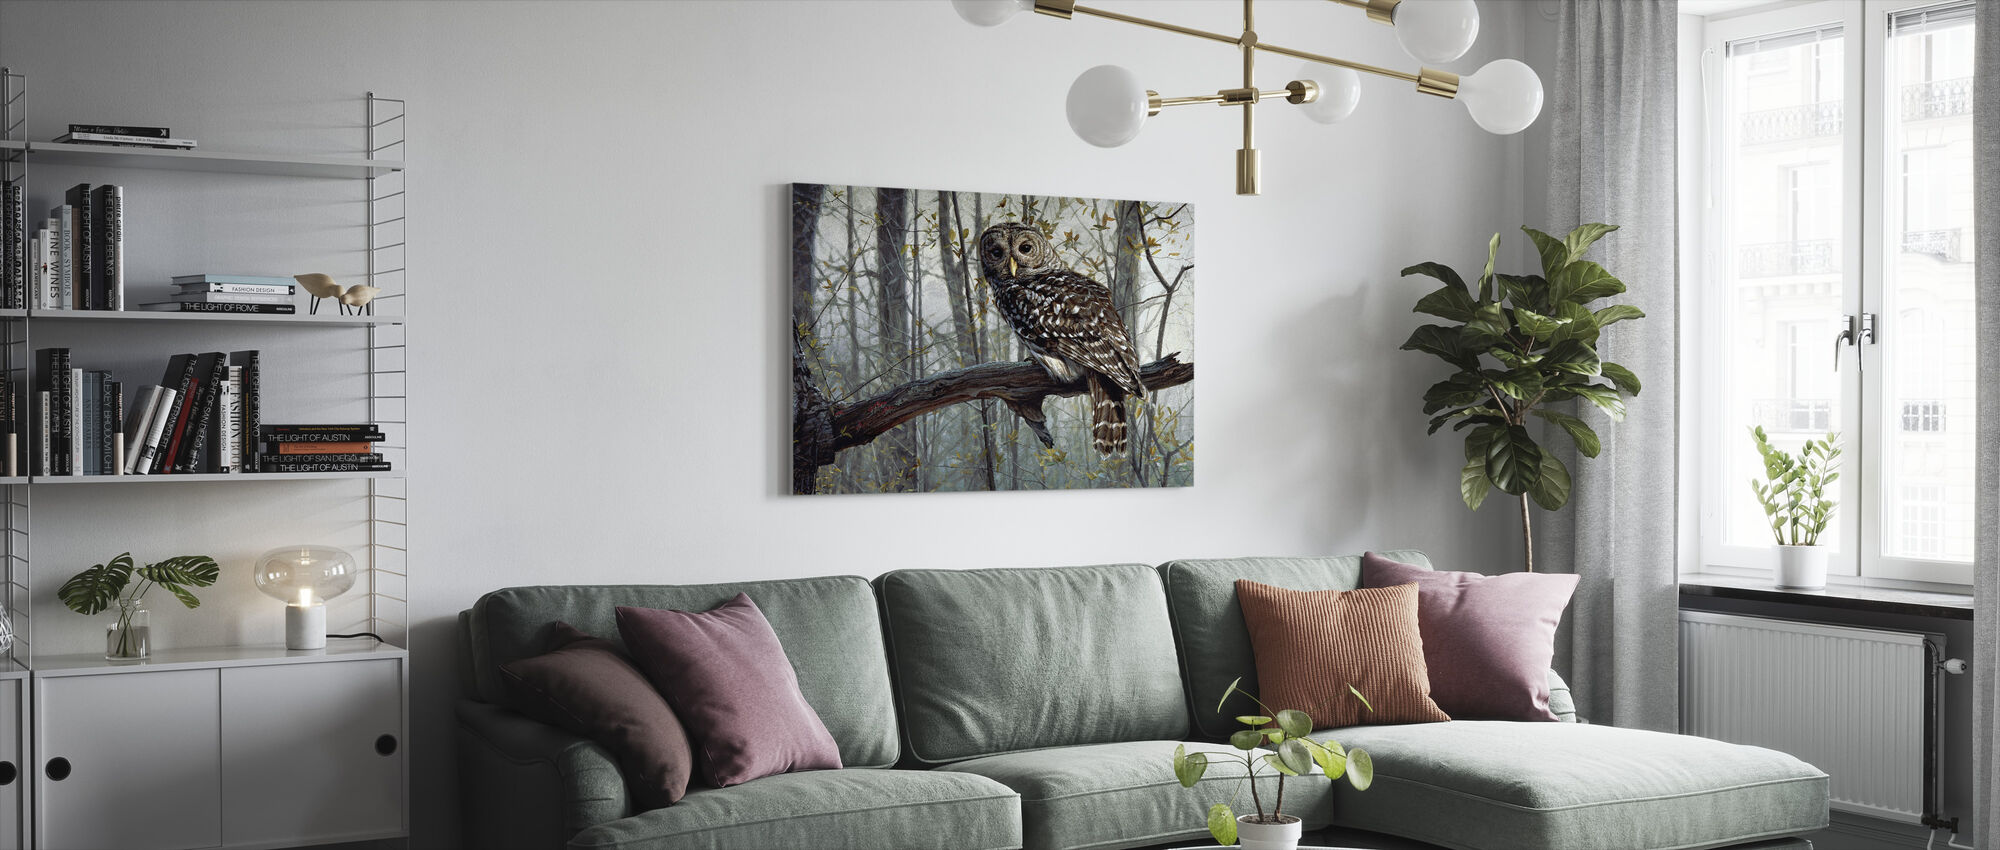 Skogens ande - Canvastavla - Vardagsrum